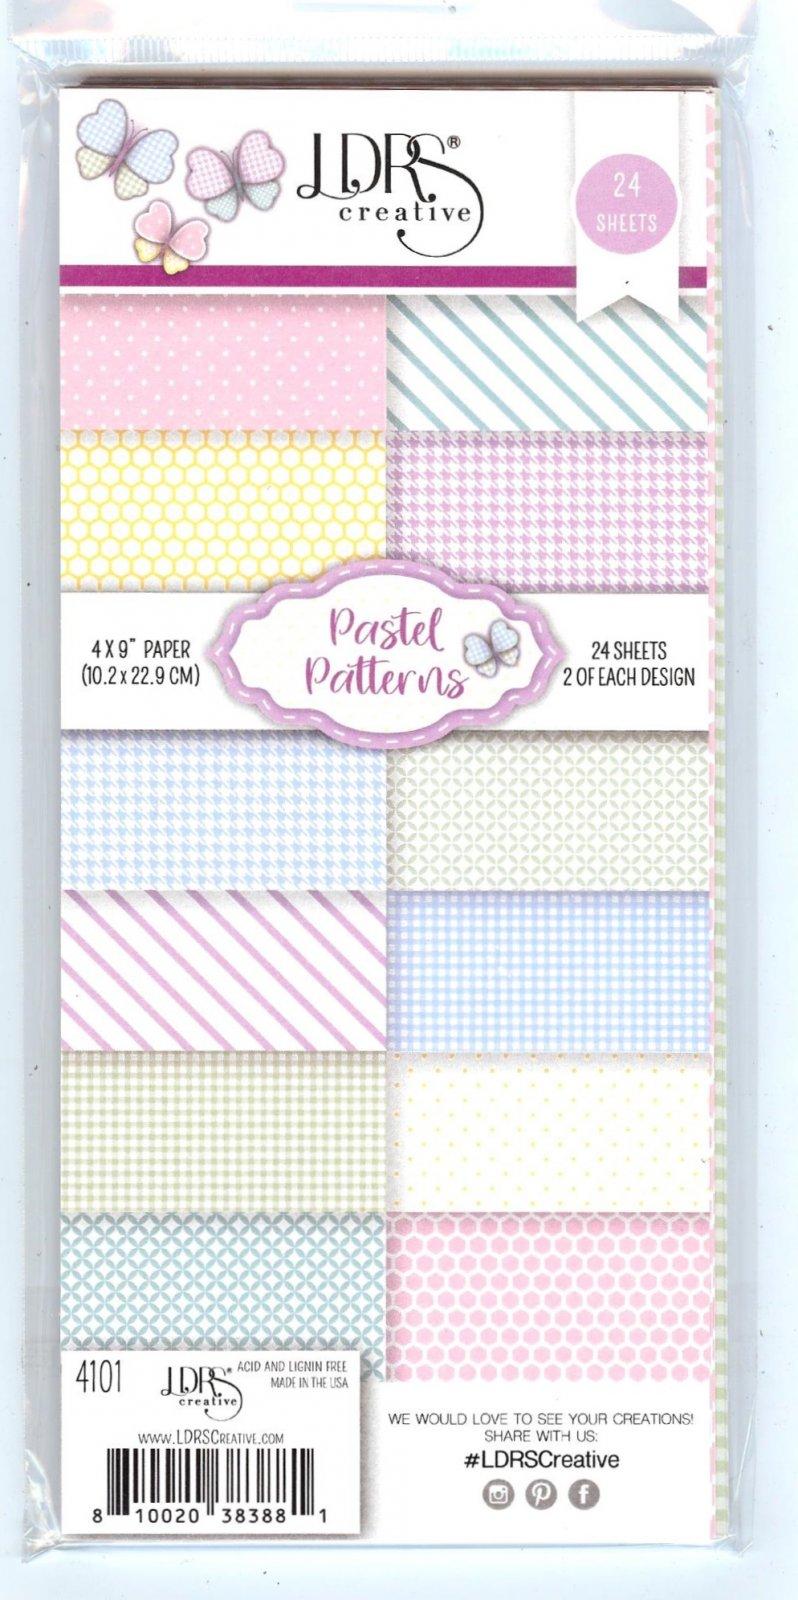 LDRS - Pastel Patterns, 4 x 9